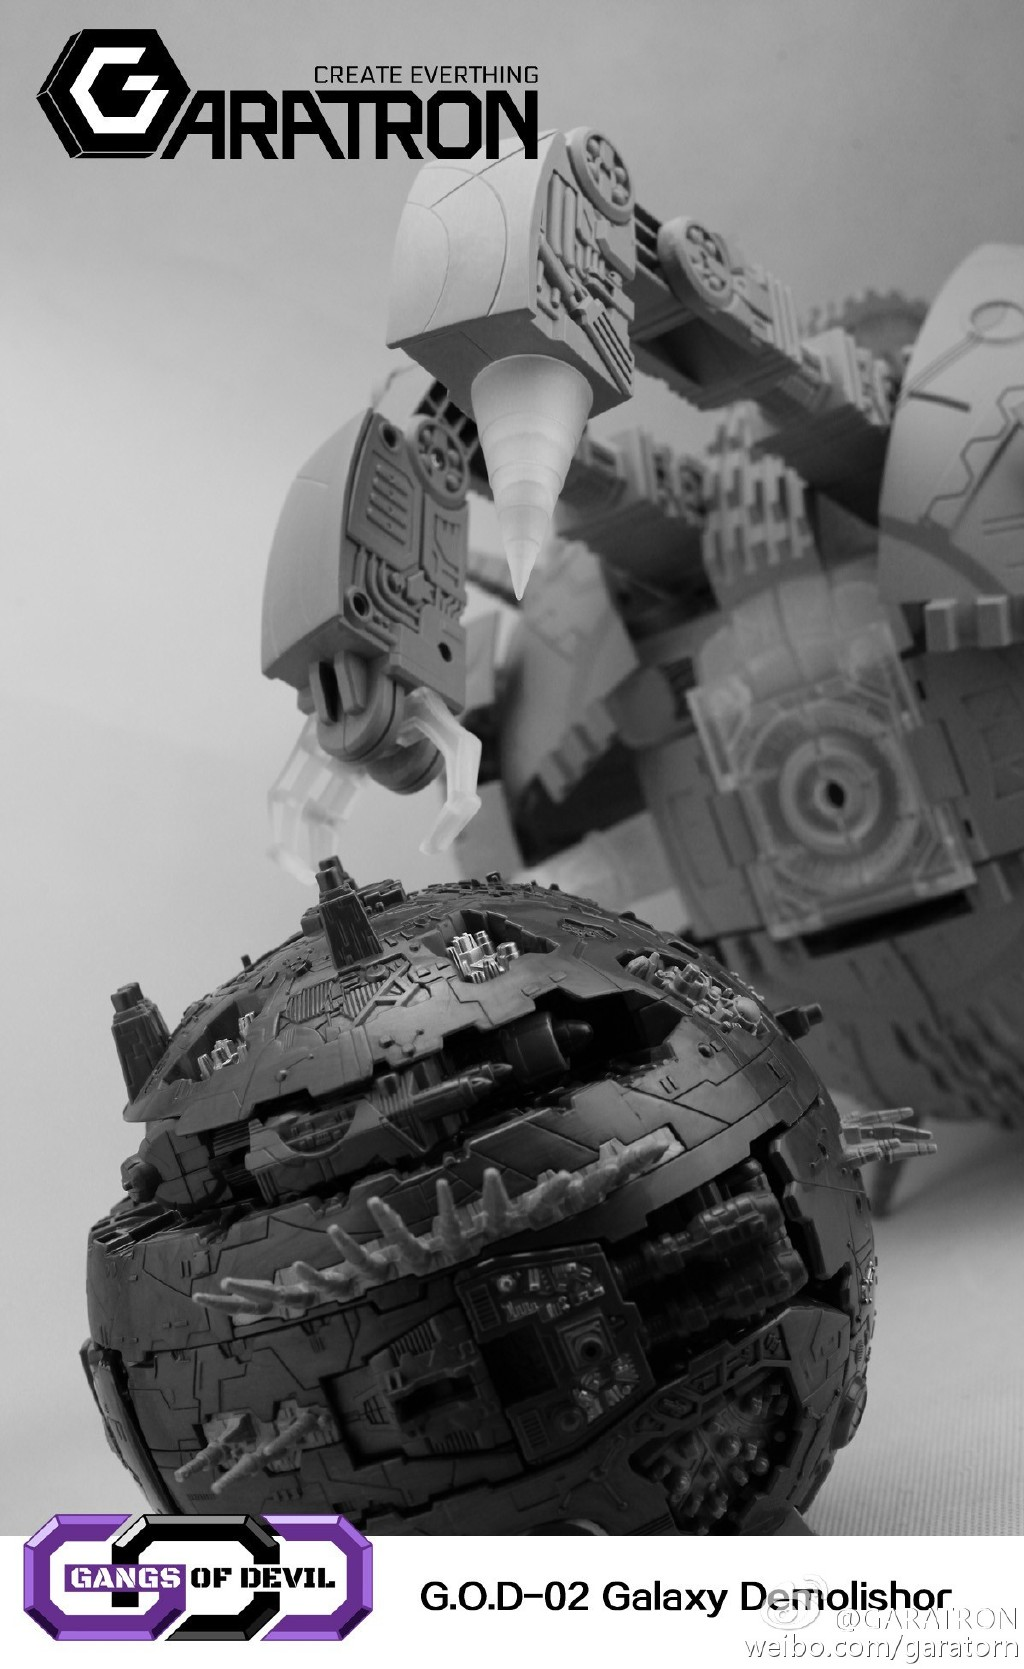 [Garatron] Produit Tiers - Gangs Of Devils G.O.D-02 Galaxy Demolishor - aka Unicron (Beast Wars Neo) Uni17